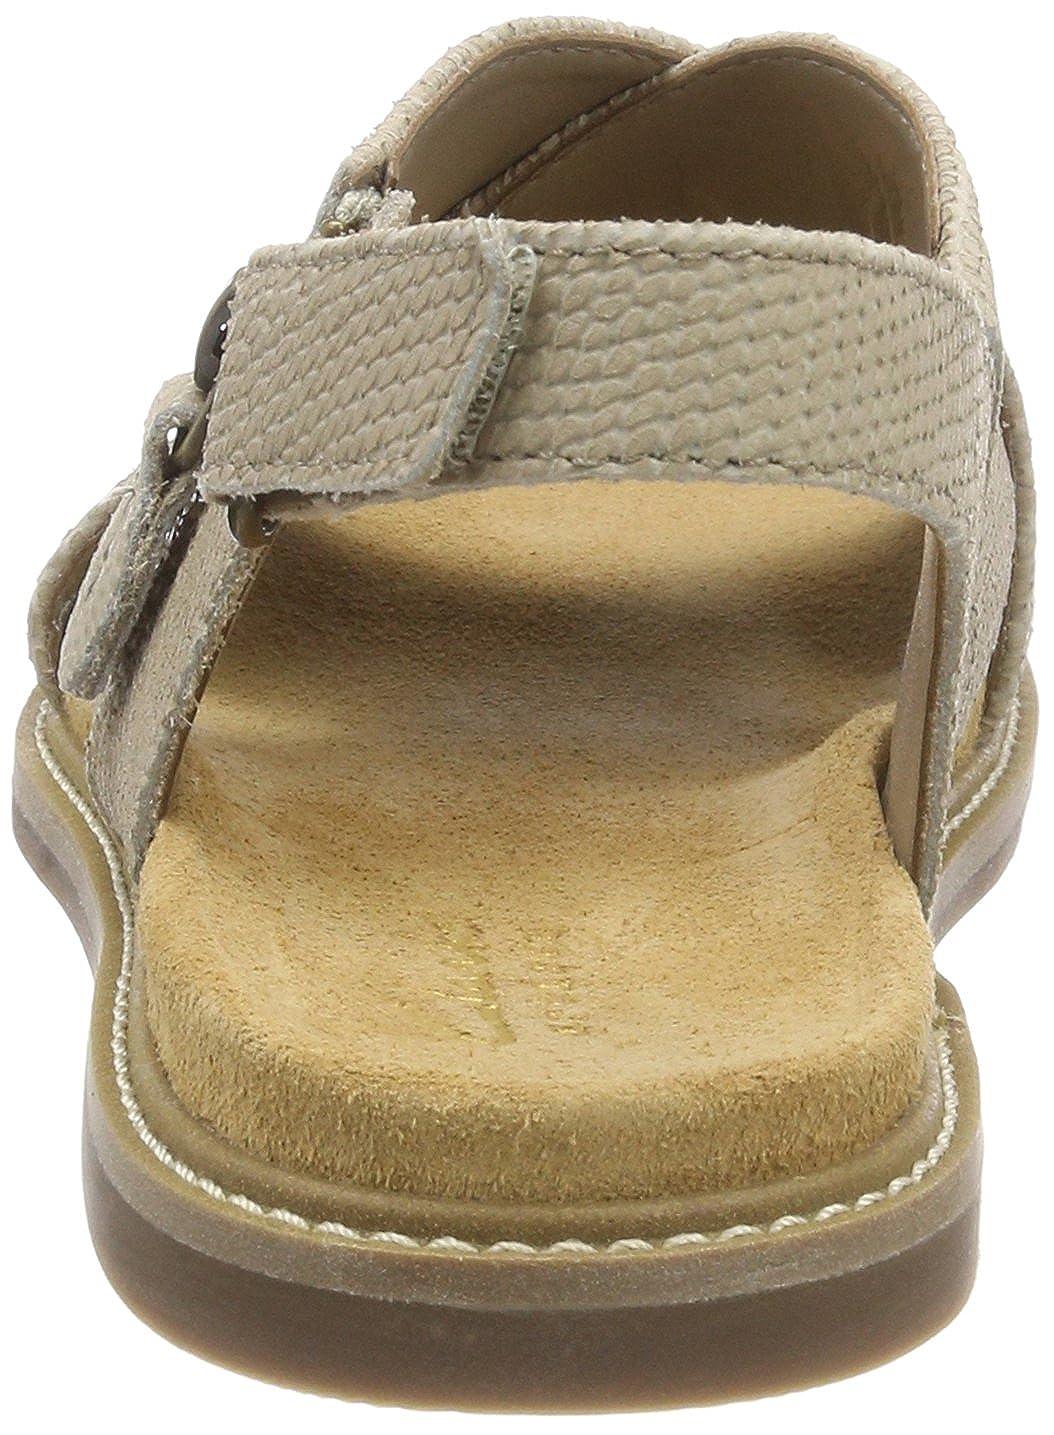 Clarks Corsio Damen Corsio Clarks Calm Slingback Sandalen Beige (Sand Leder) 95bf74